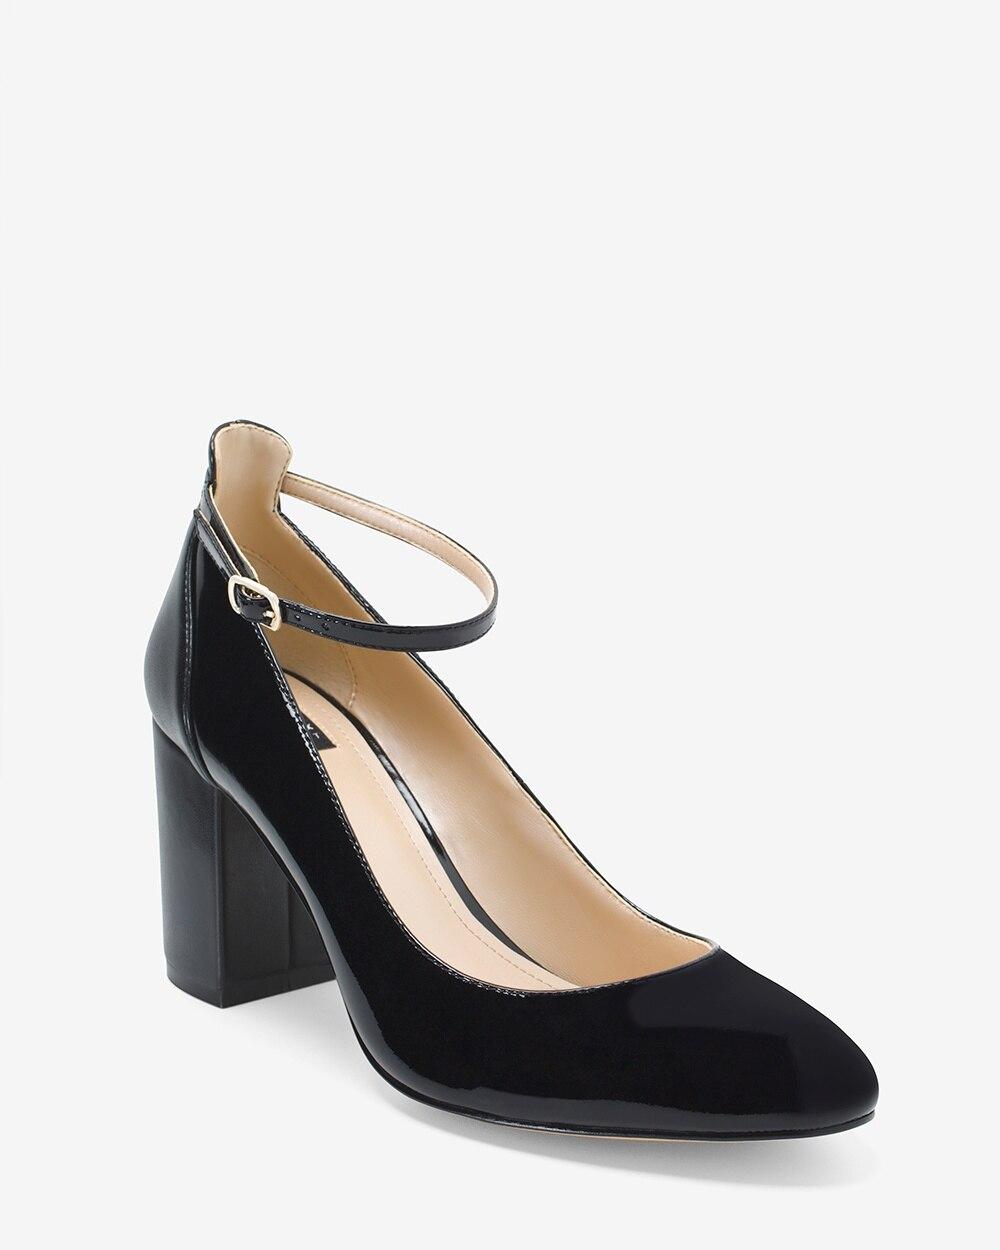 Black Patent Leather Chunky Heel Mary Janes - White House Black Market